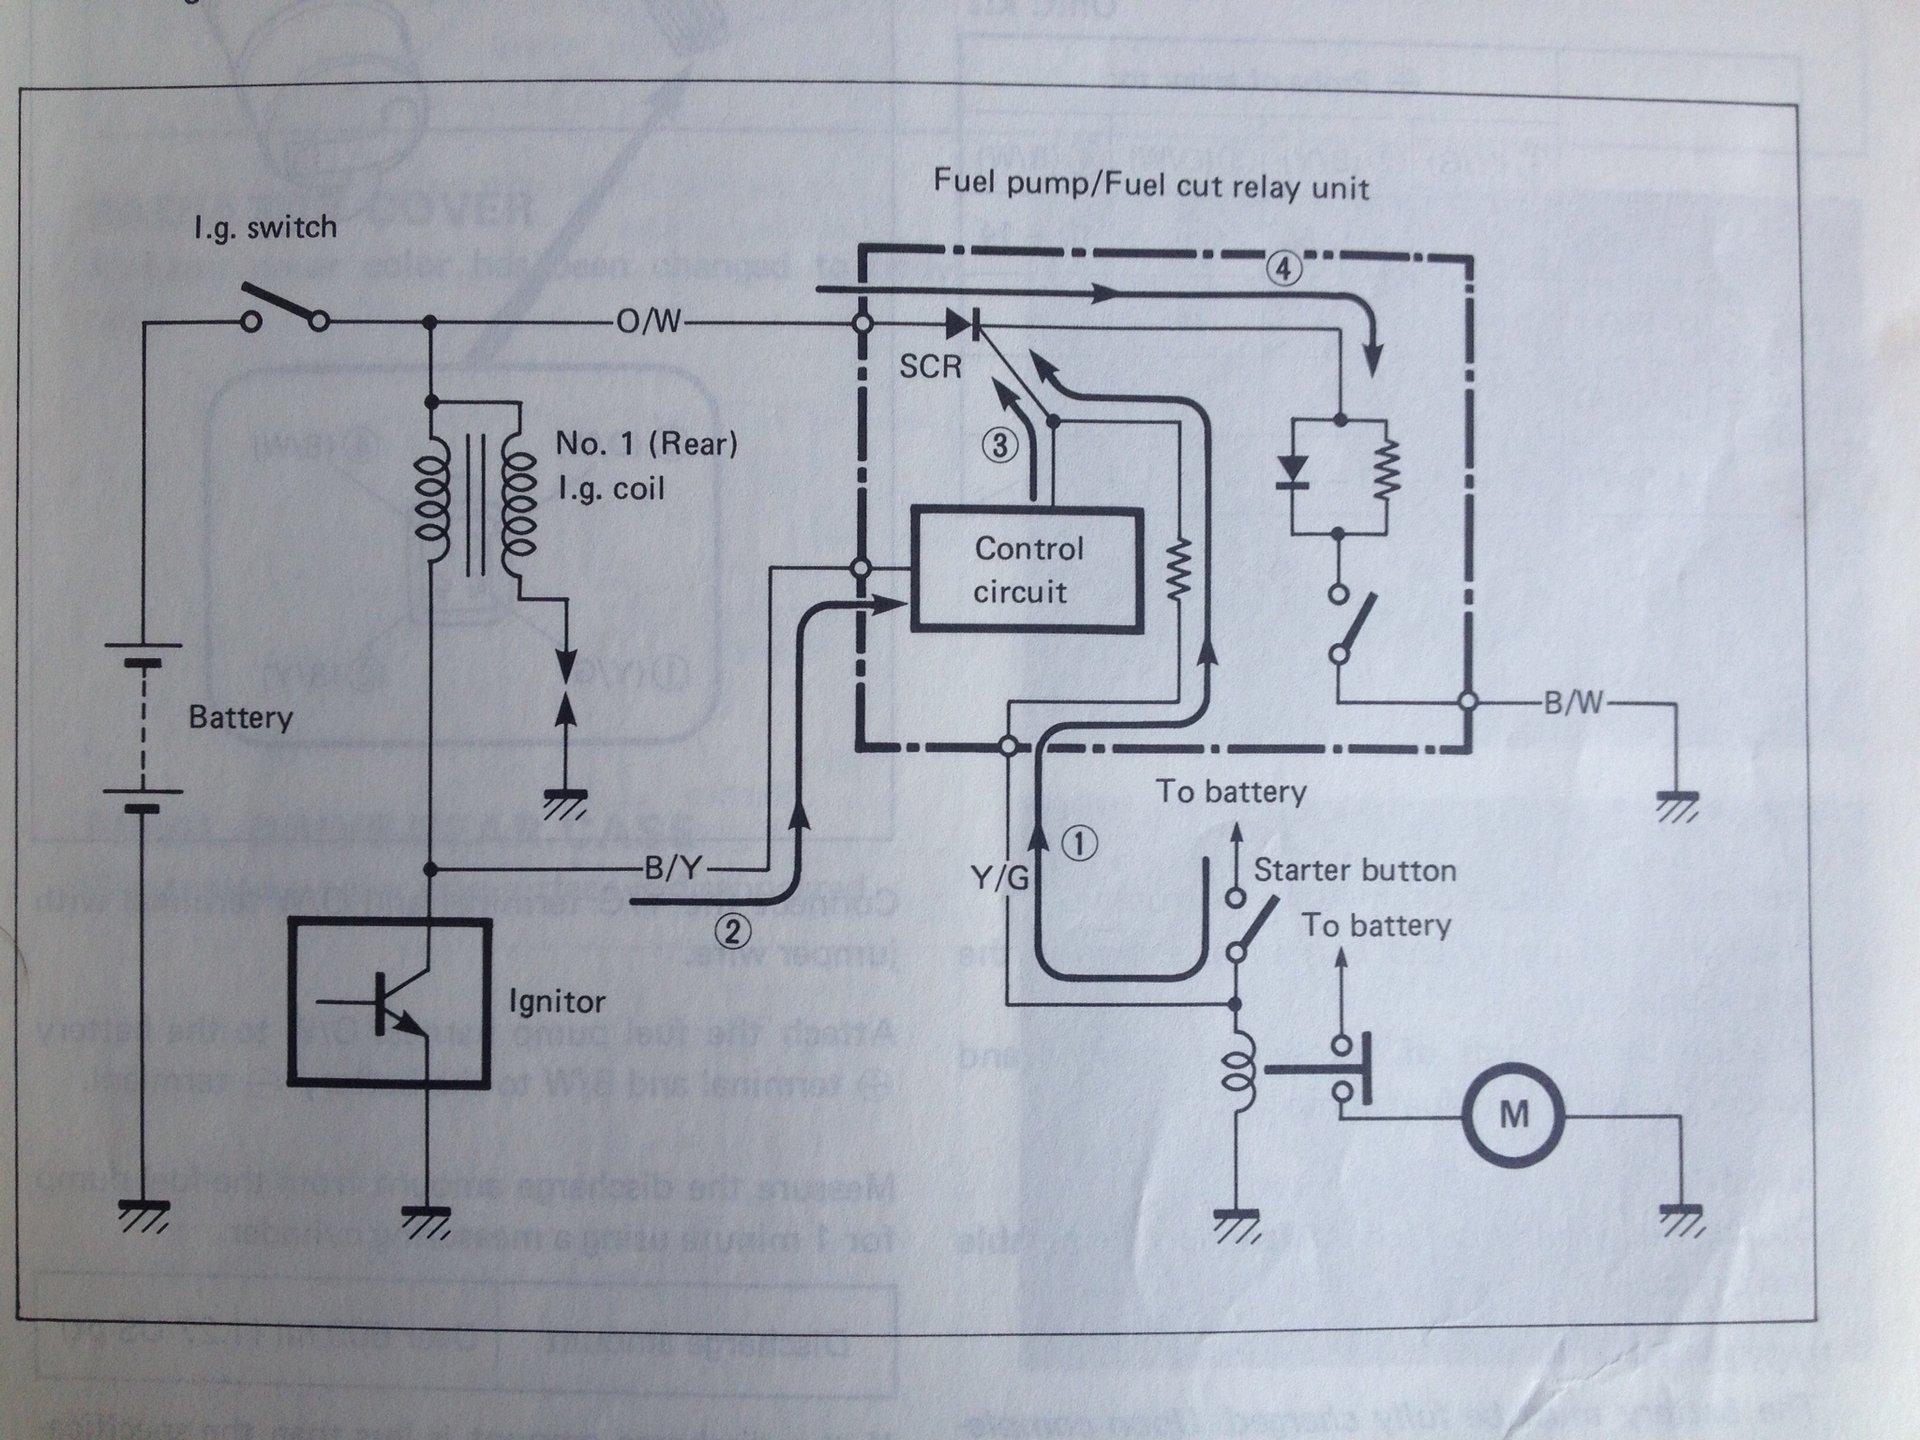 1987 Intruder fuel pump | Motorcycle Forum | Vs 1400 Wiring Diagram |  | Motorcycle Forum